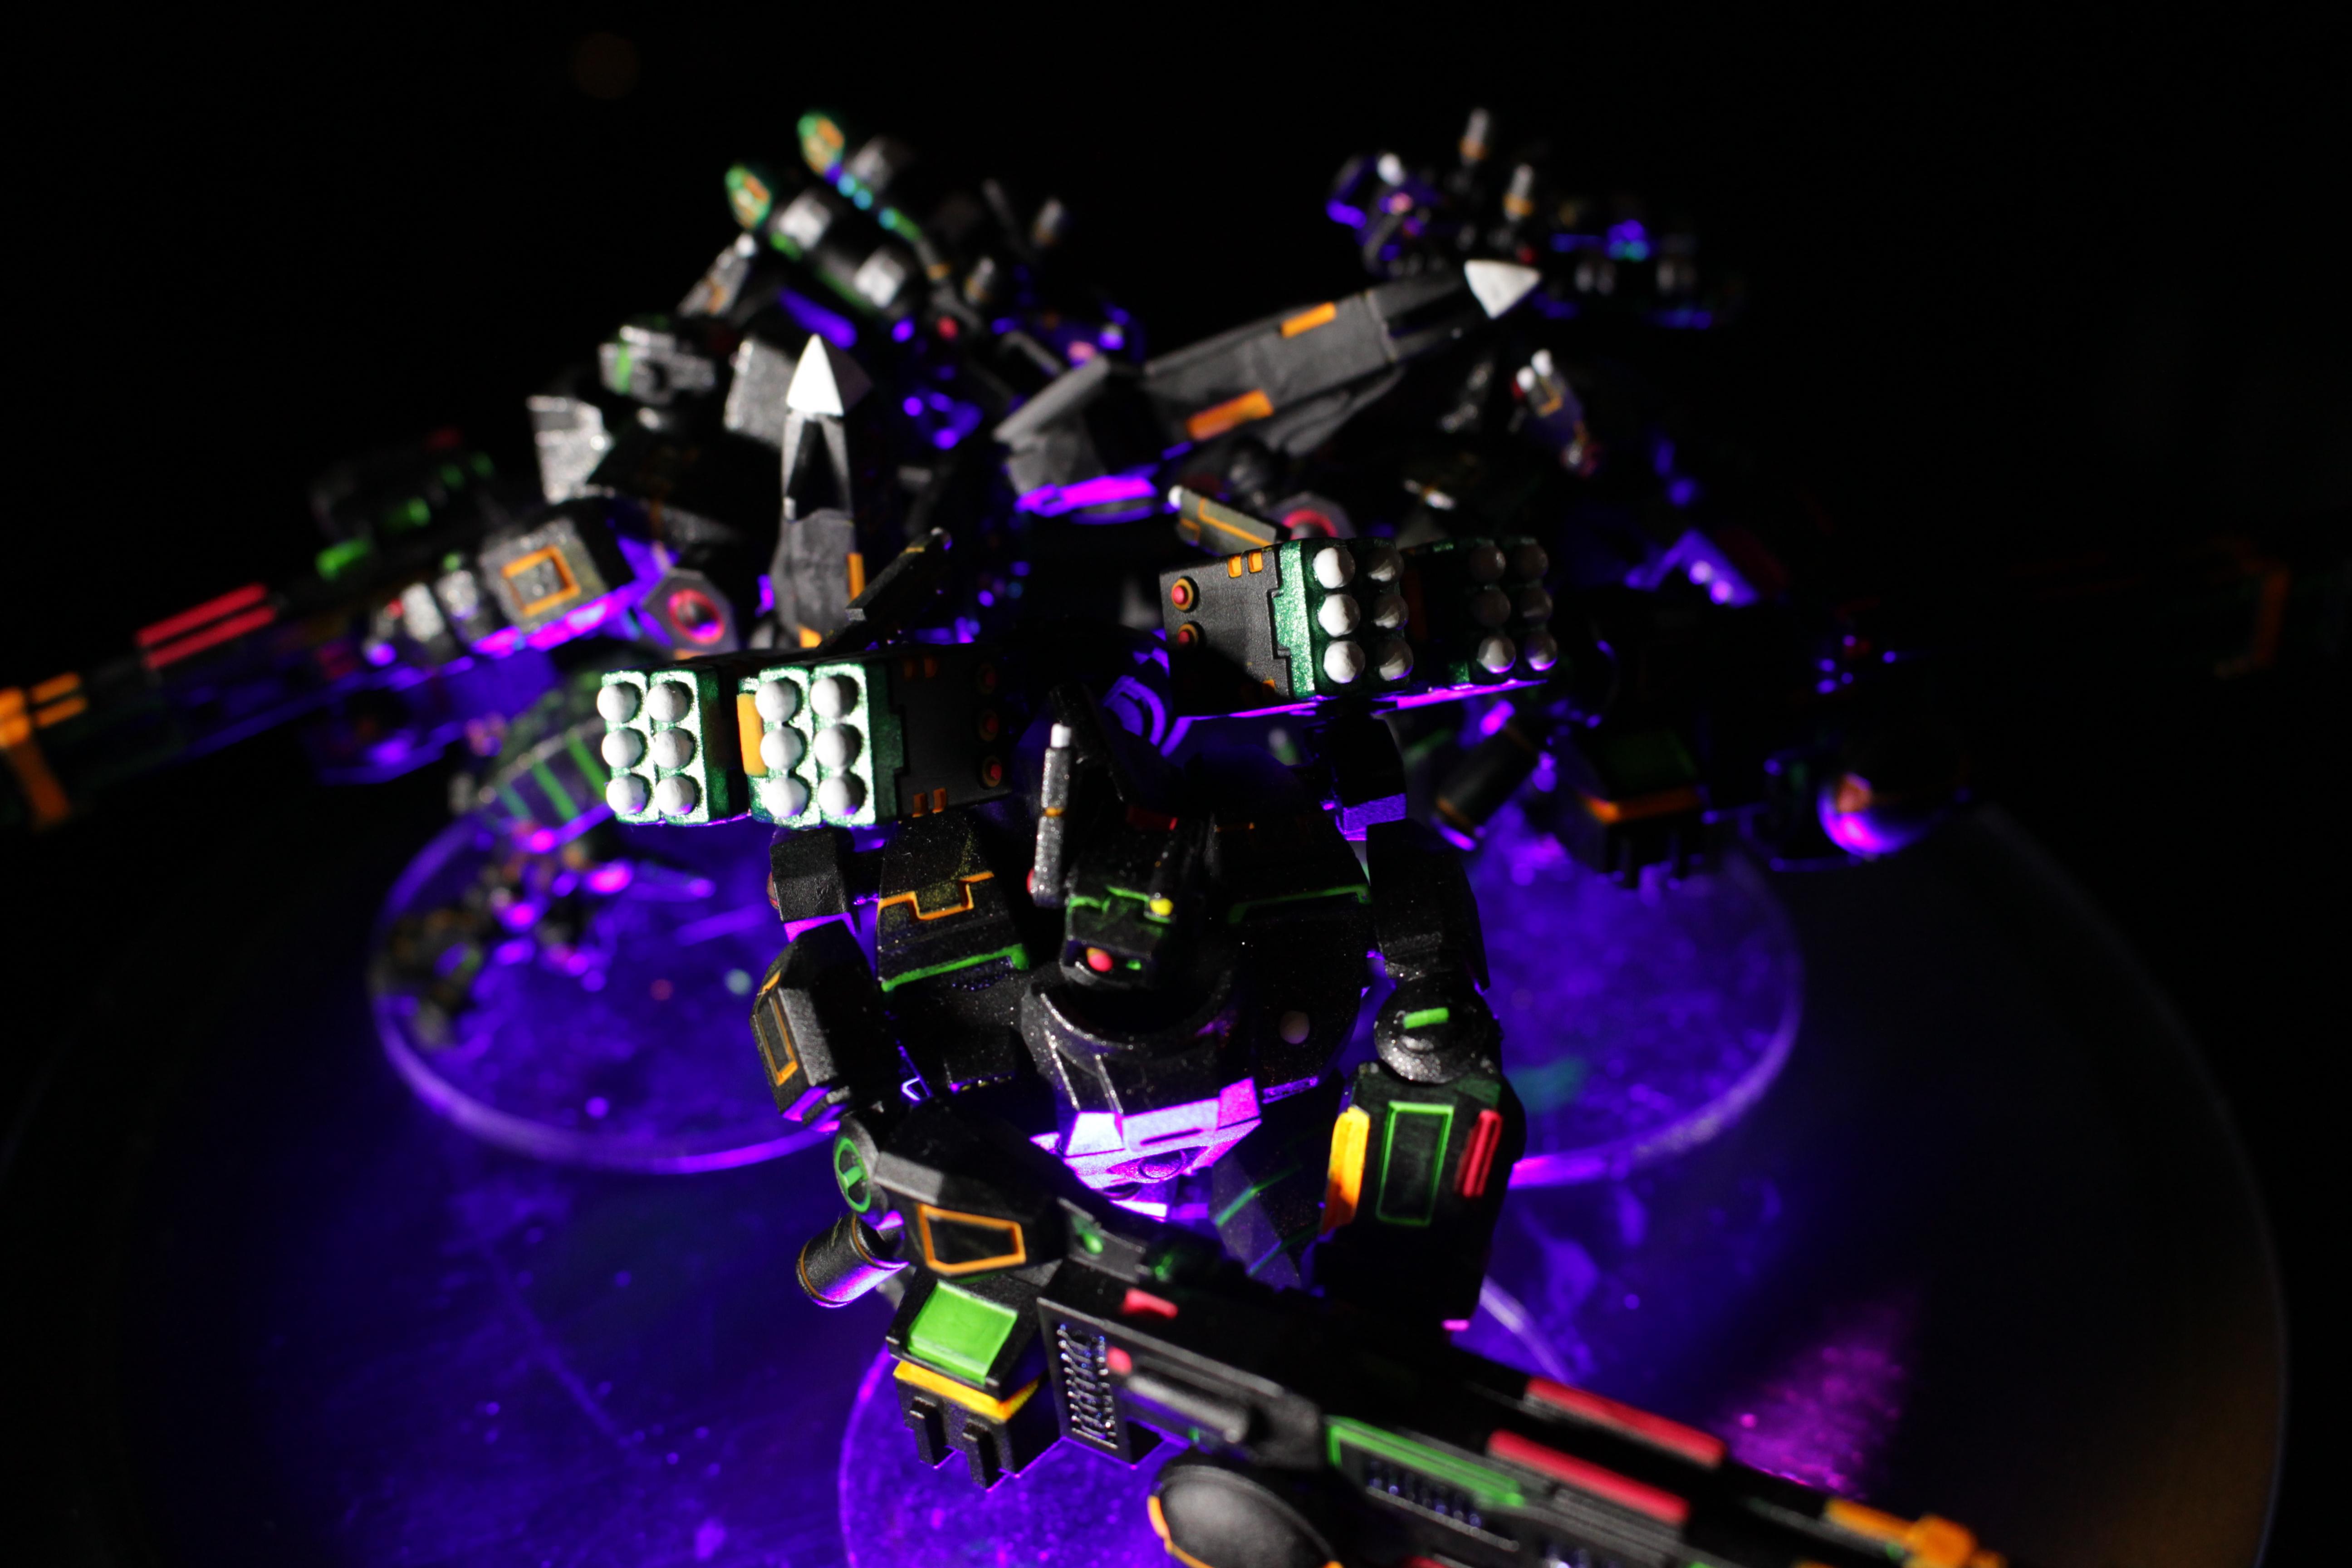 Army, Broadsides, Group, Ke'lshan, Neon, Pathfinders, Tau, Tron, Warhammer 40,000, Xv